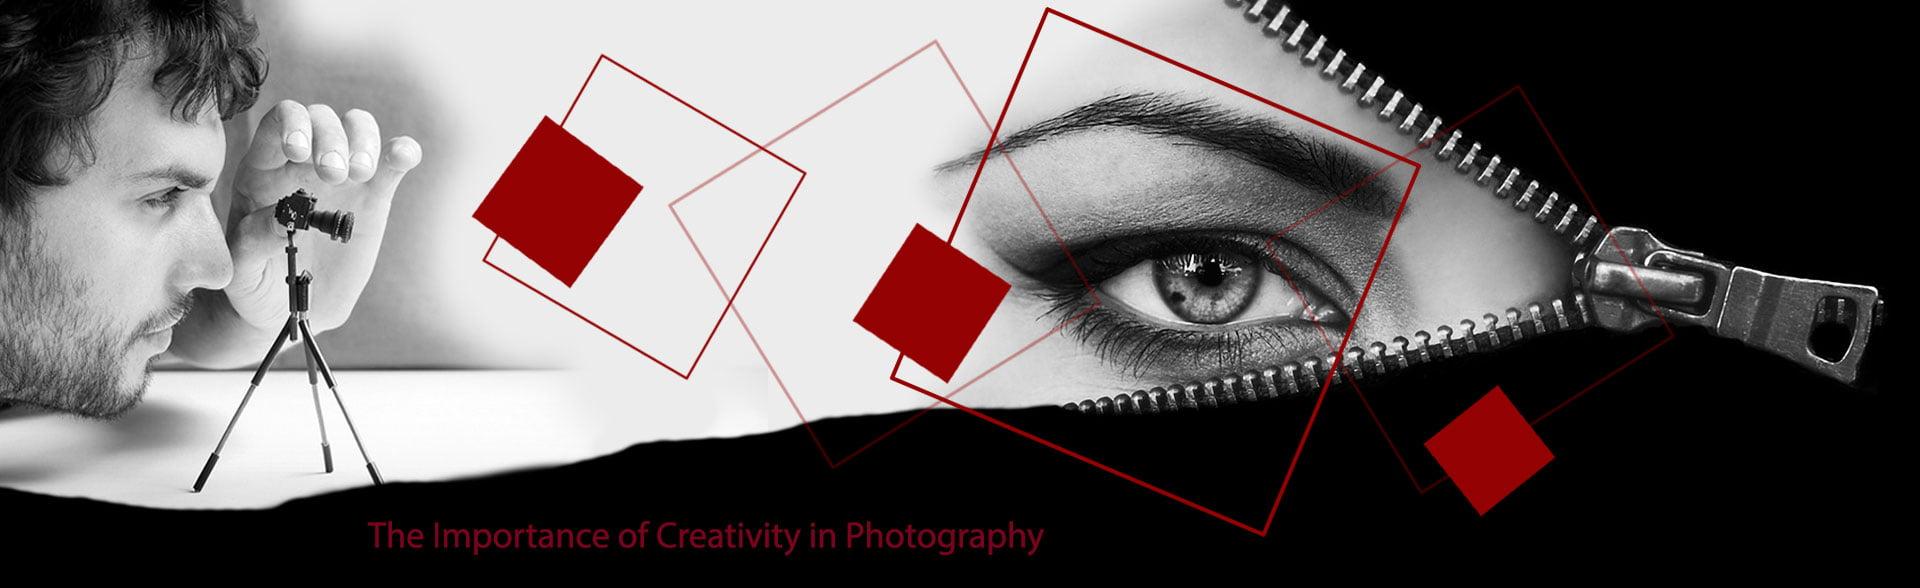 Creative photography 2 - اهمیت خلاقیت در عکاسی